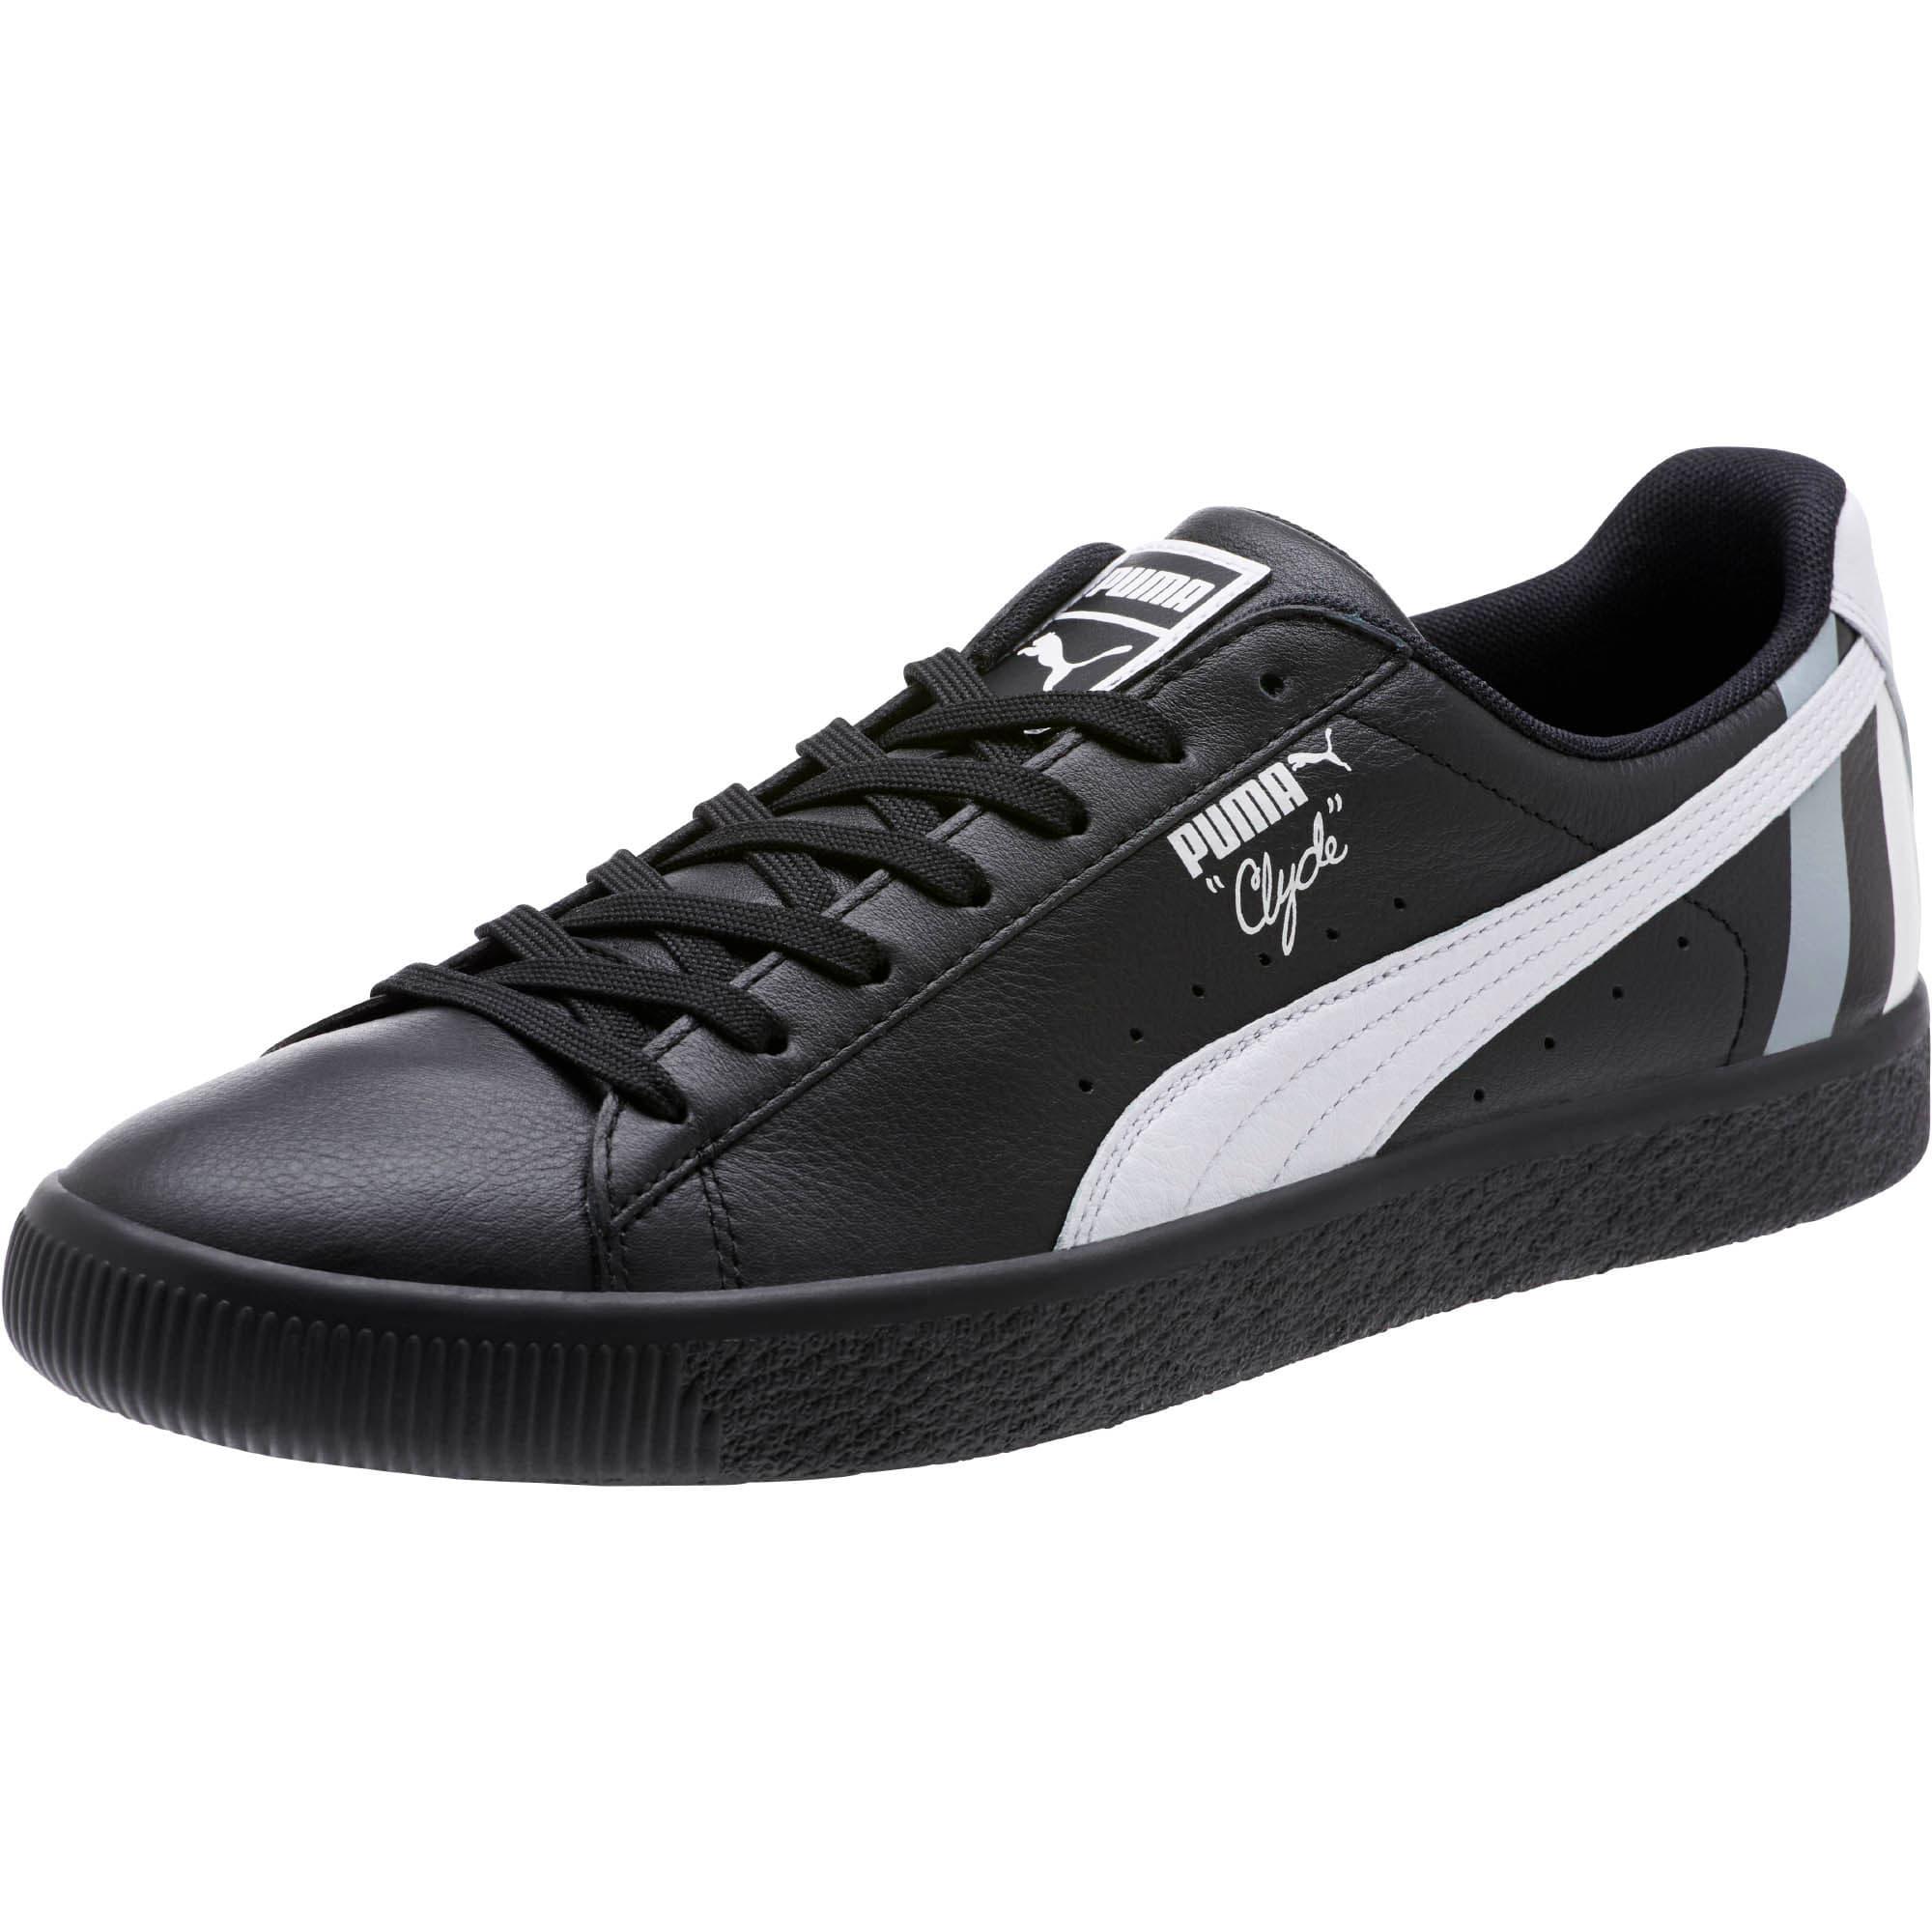 Thumbnail 1 of Clyde Stripes Men's Sneakers, Puma Black-Puma White, medium